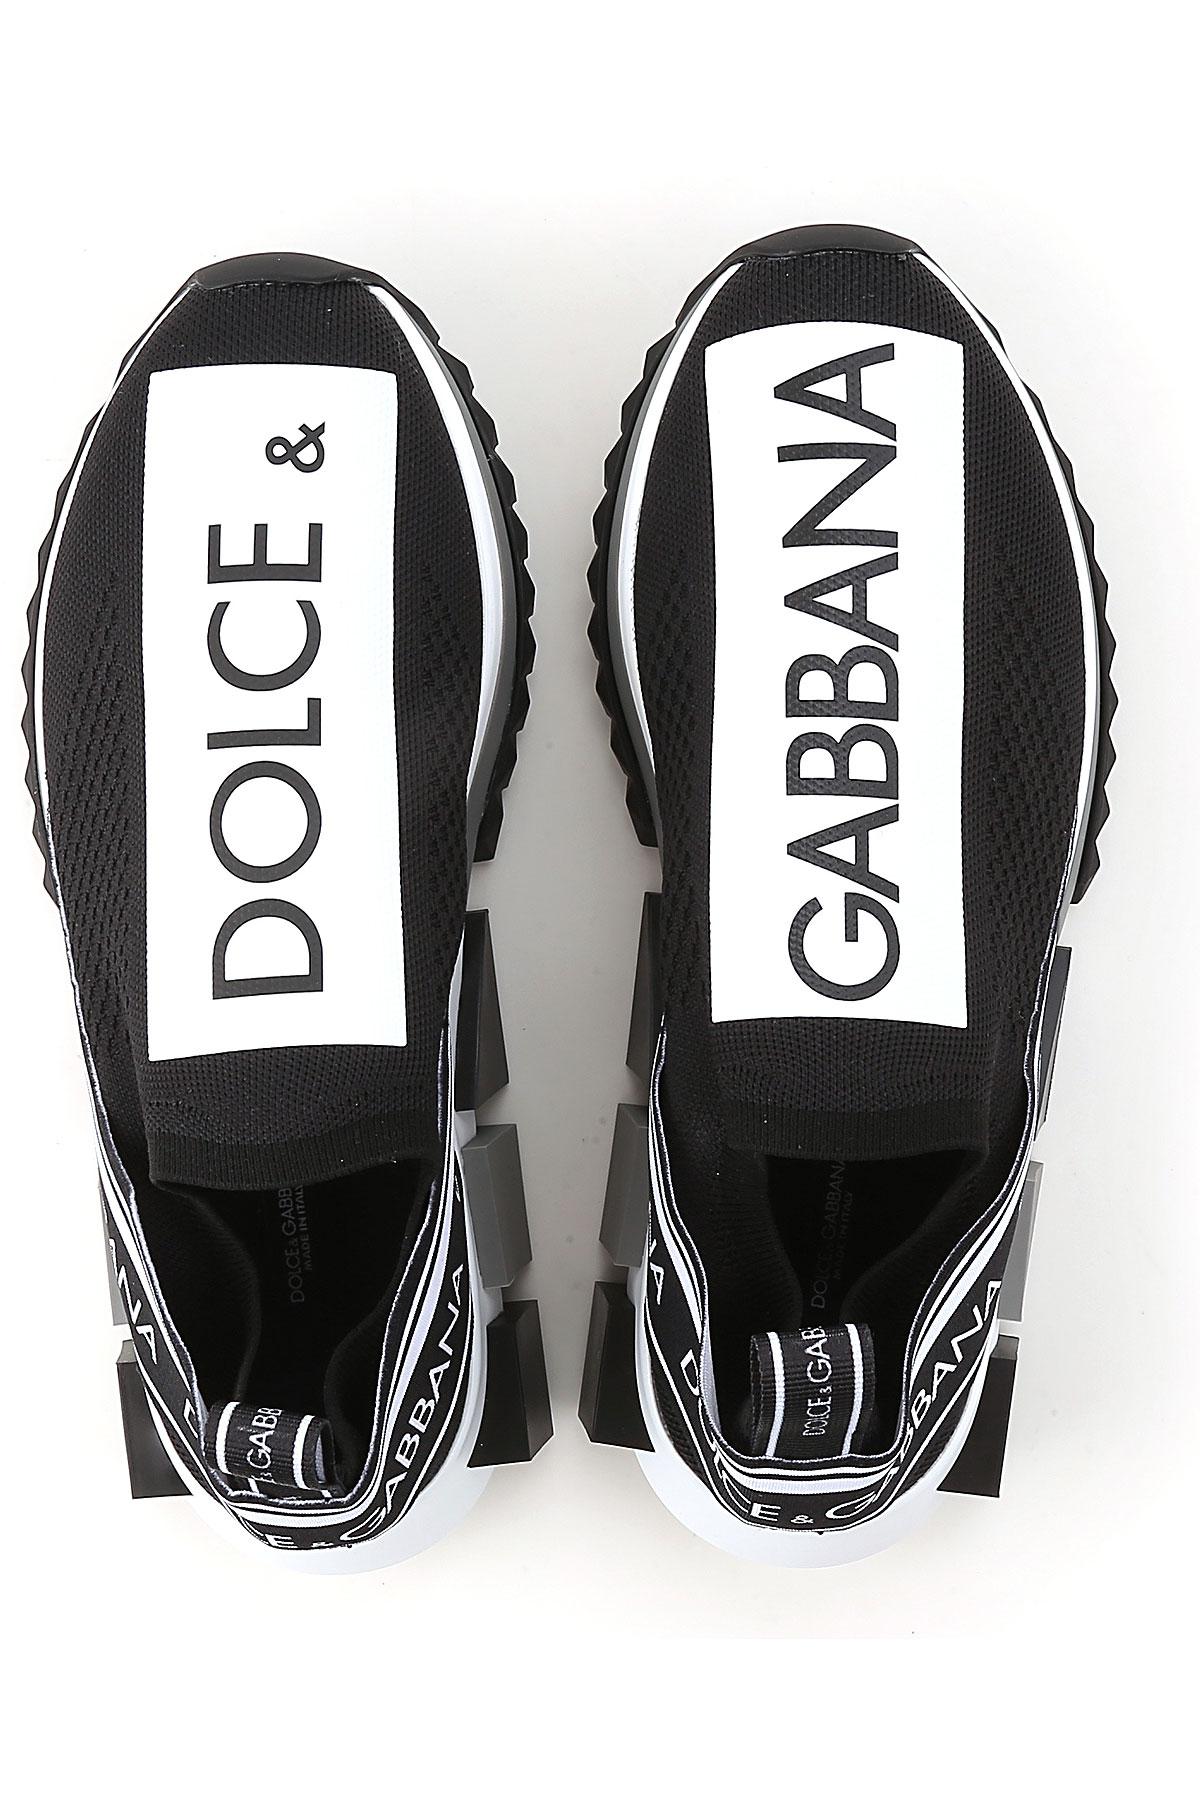 Zapatos Gabbana Dolce Blanco amp; 2019 verano Primavera Negro Hombres Para Eq5Owpr5